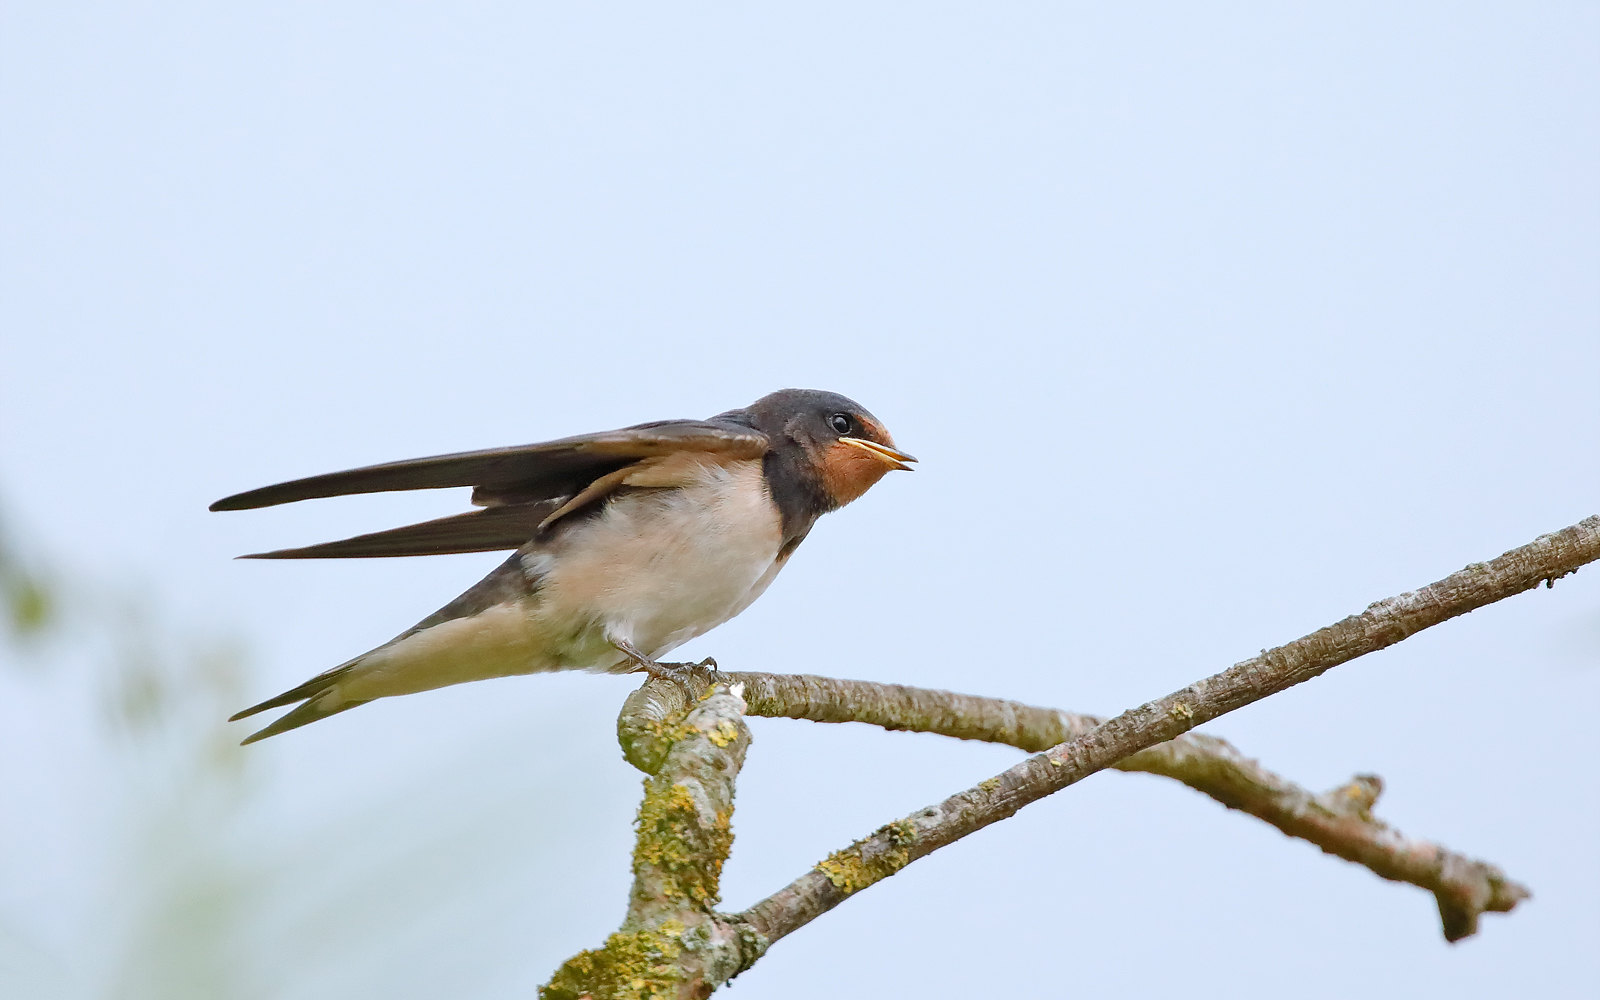 Swallow - Juvenile